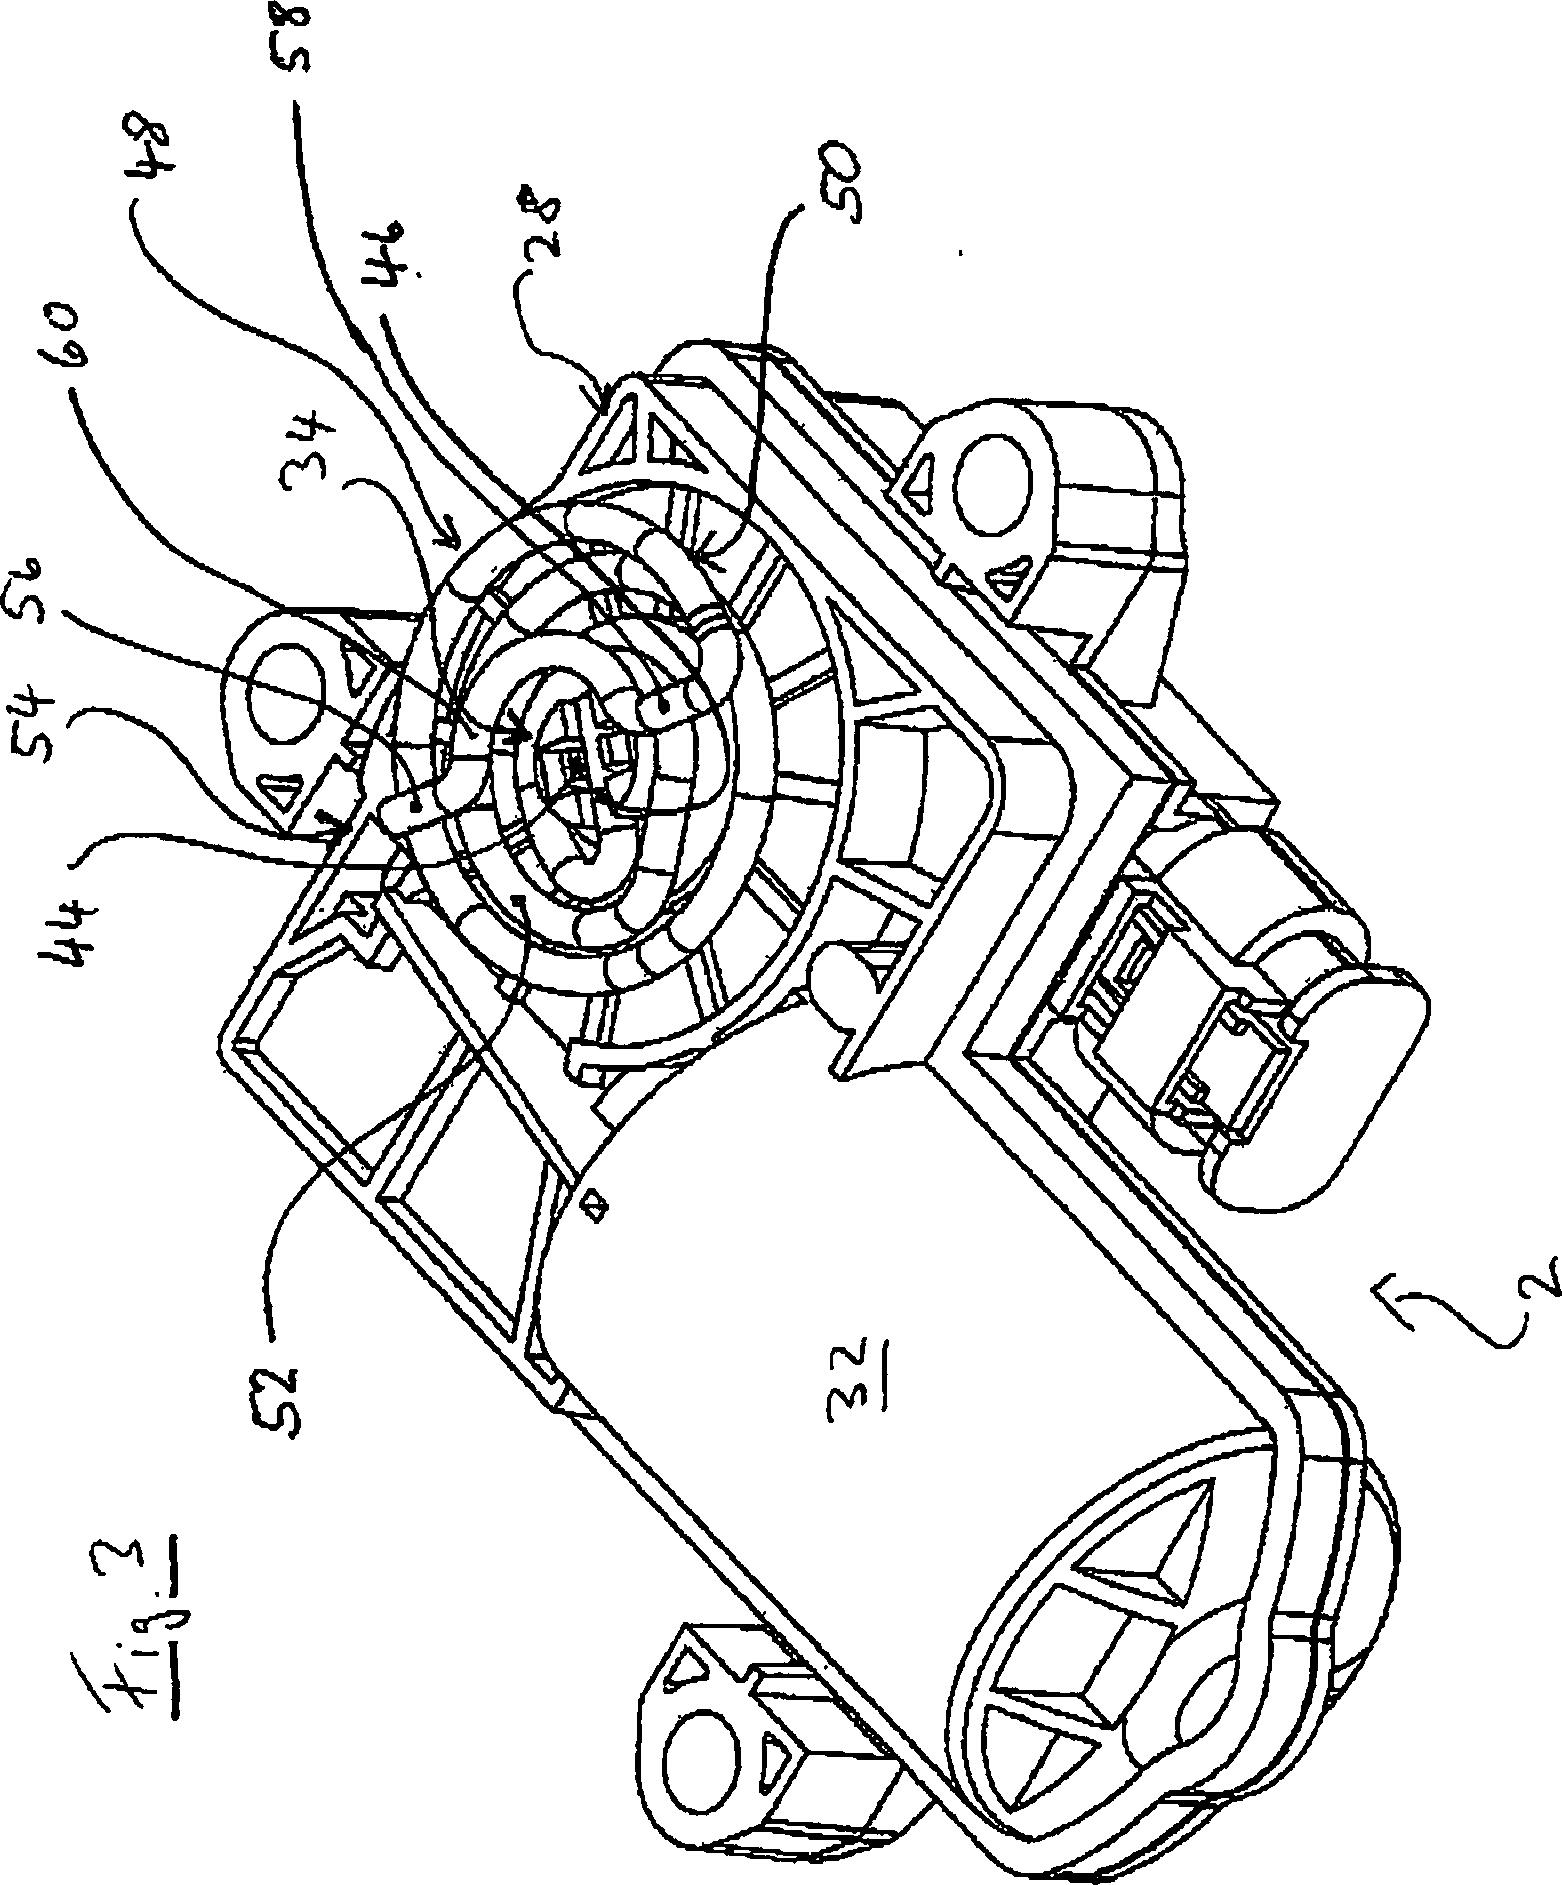 Patente De B4